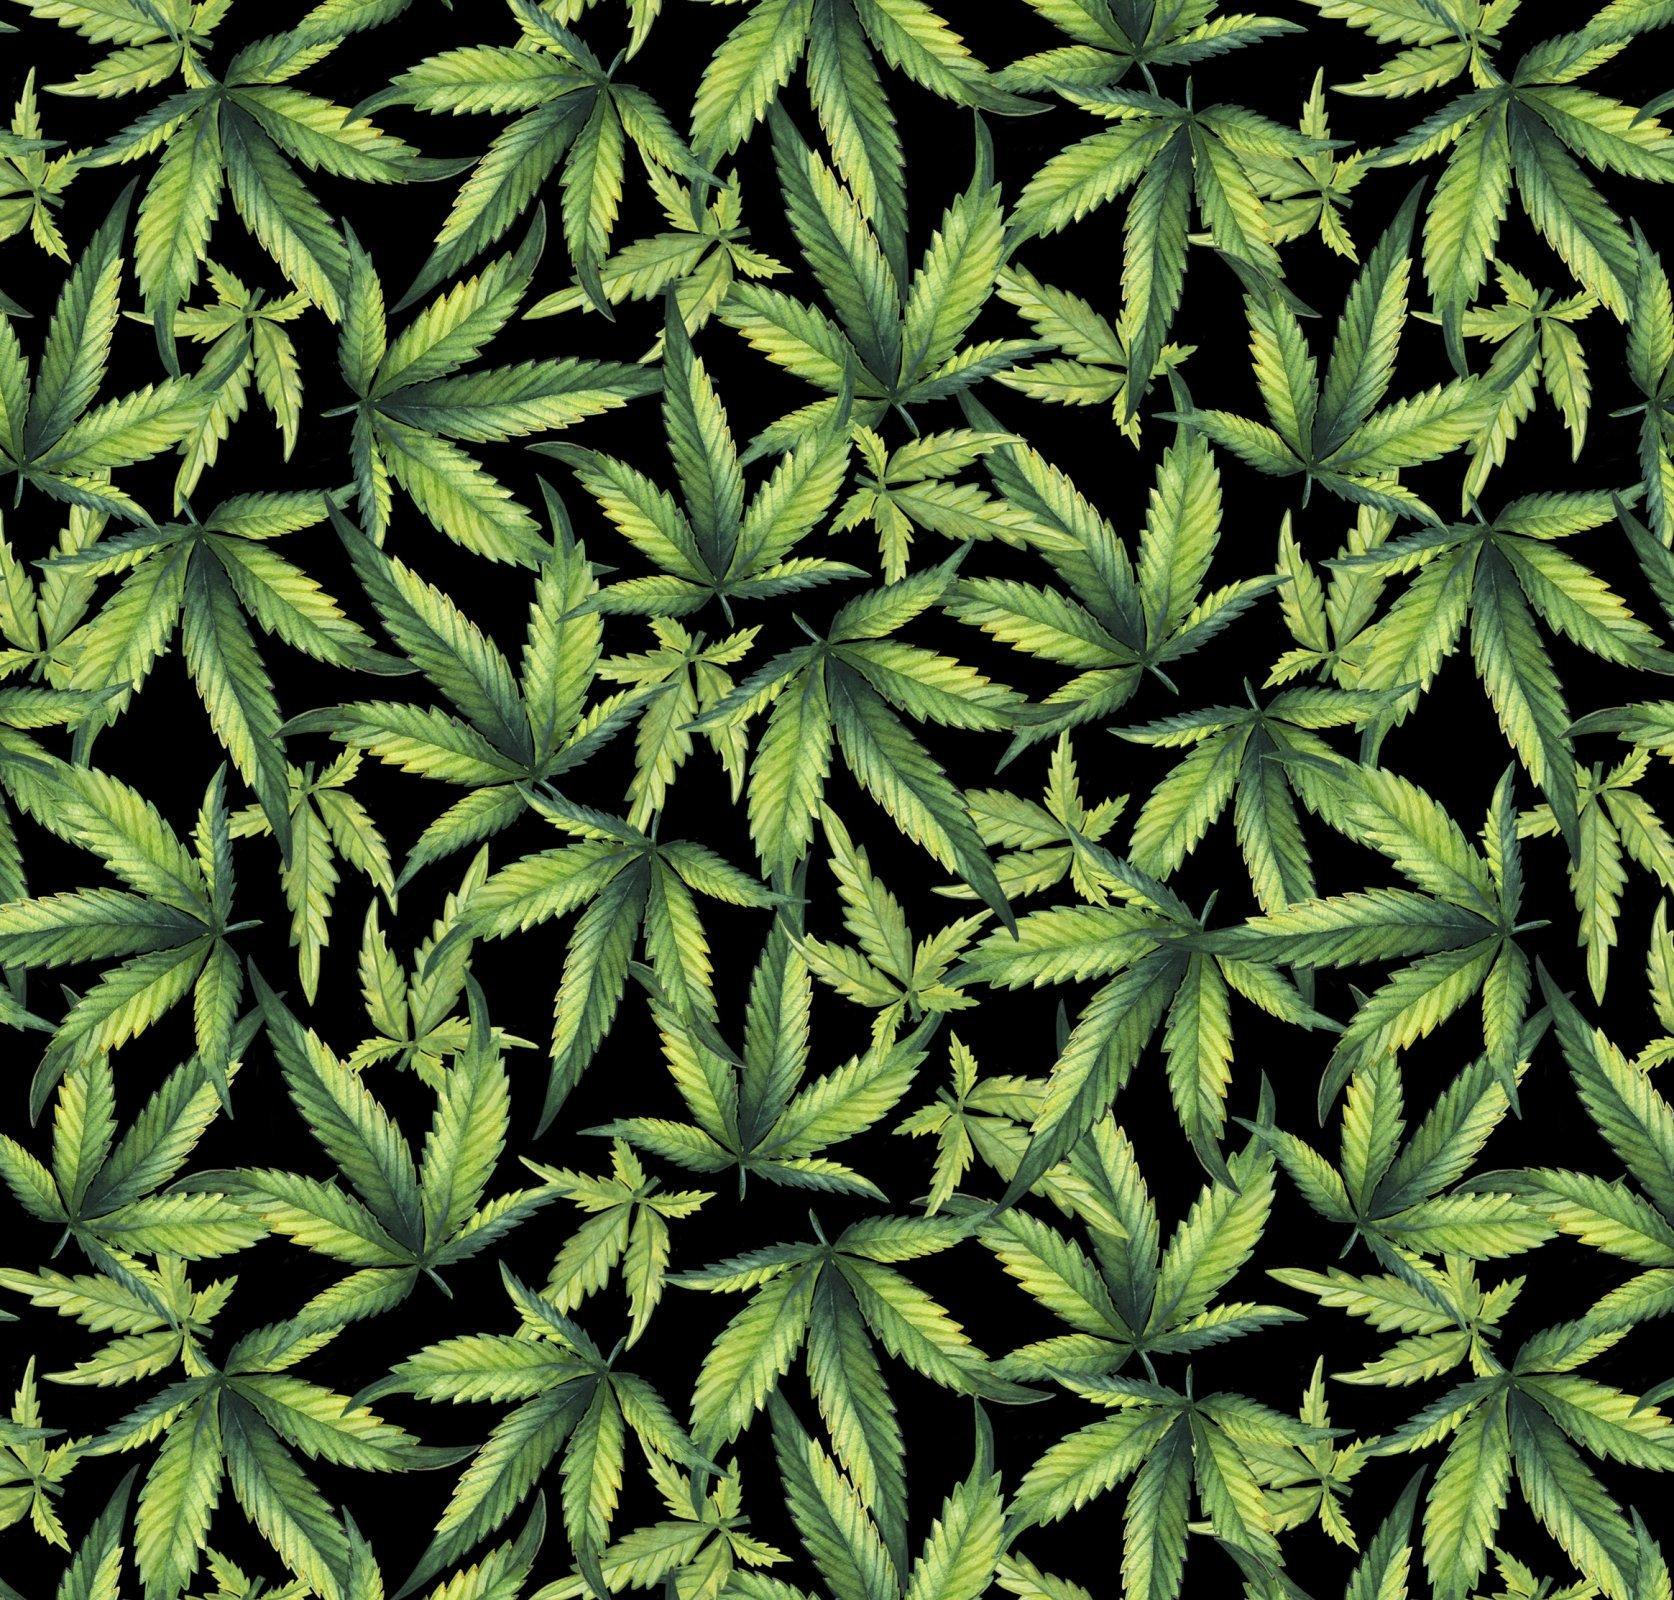 Marijuana Plant 1323 Black Background